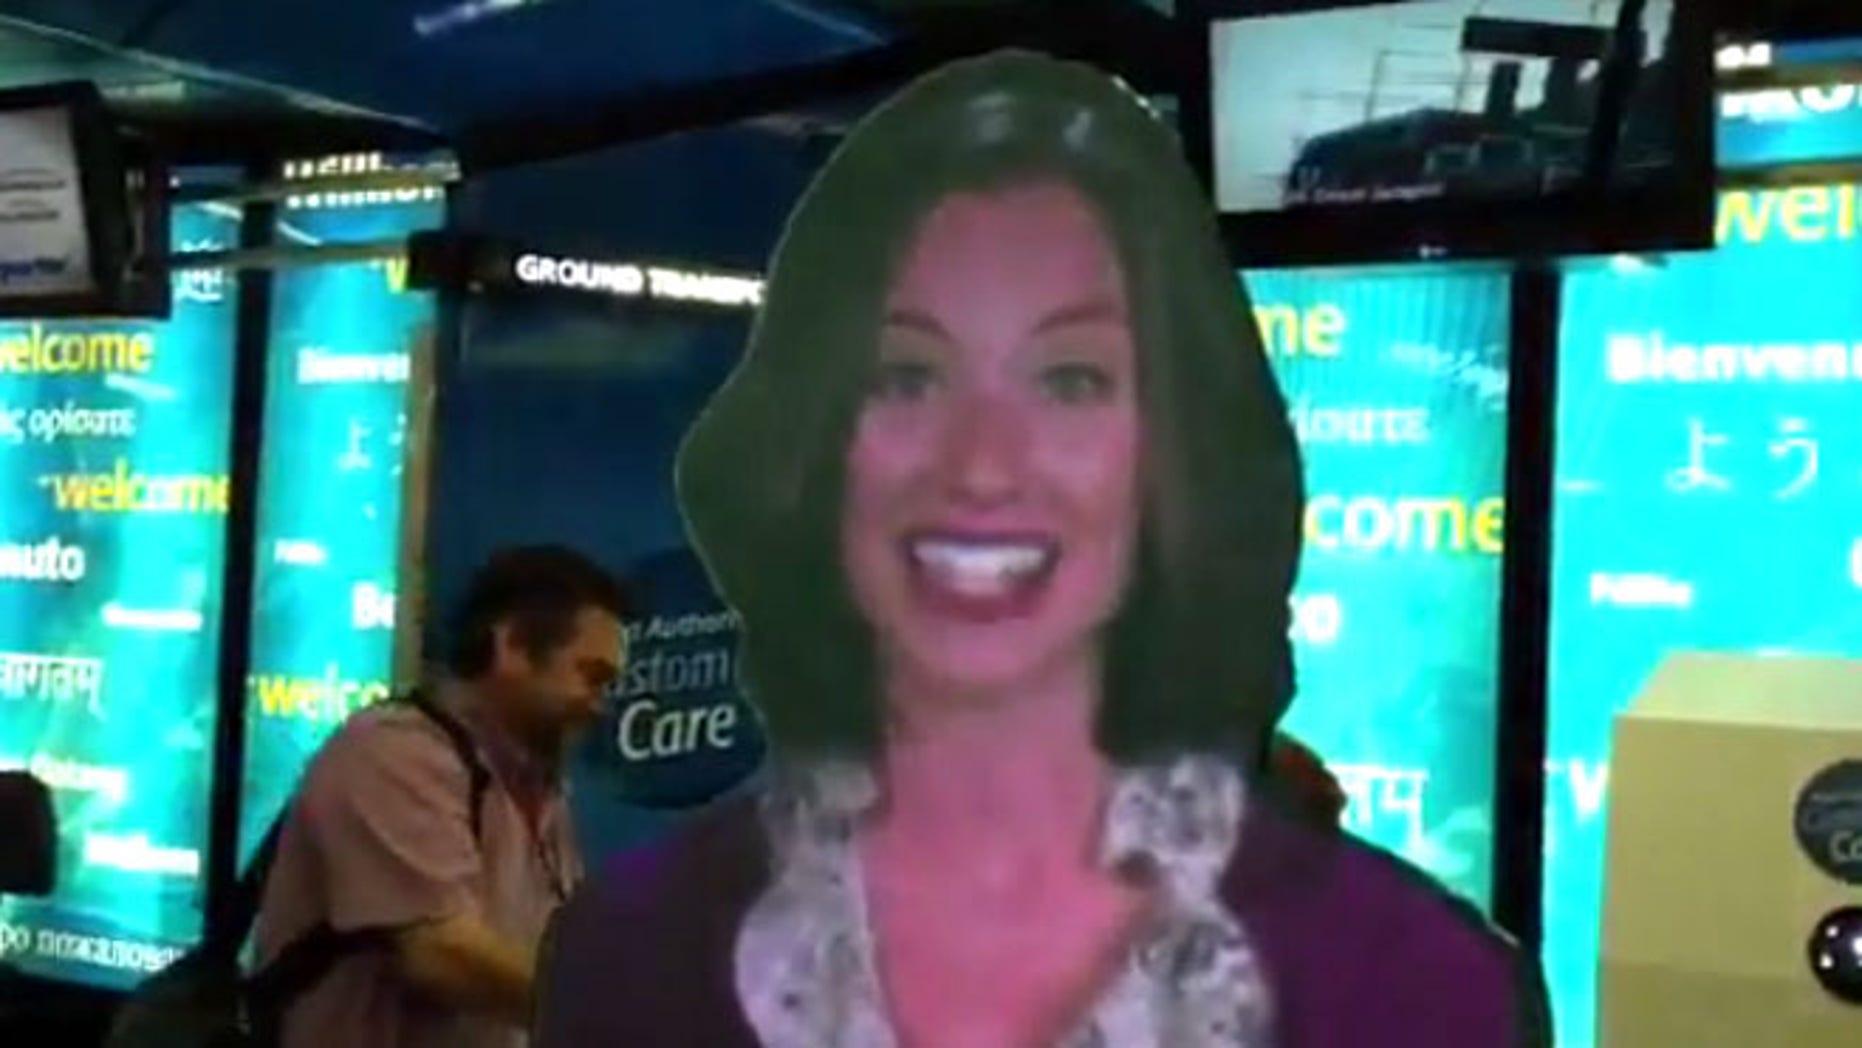 'Eva' is a hologram-like avatar that will help customers navigate LaGuardia, Newark and JFK terminal buildings.